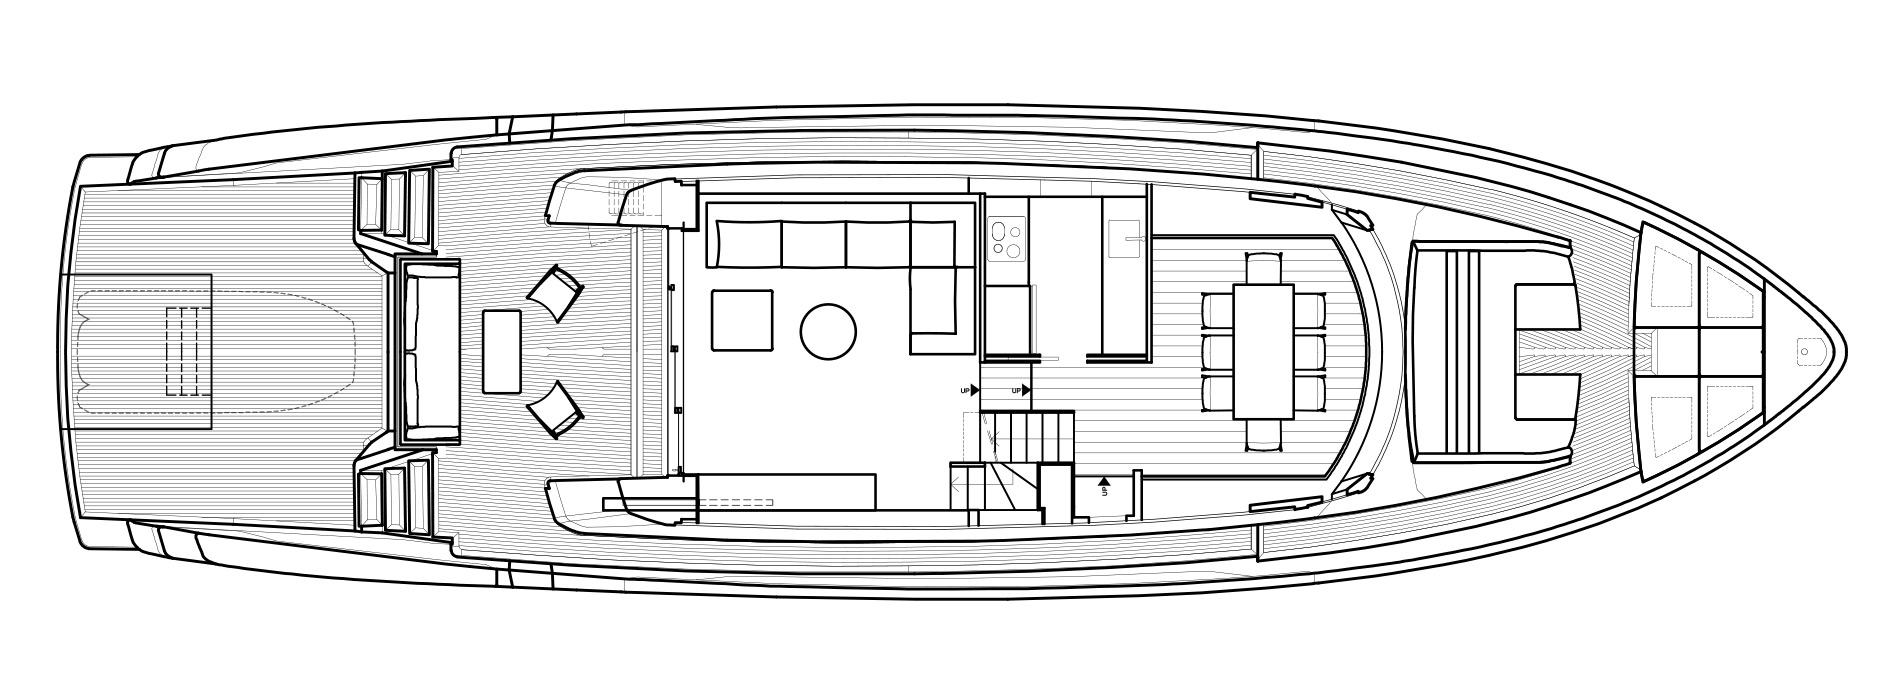 Sanlorenzo Yachts SX76 主甲板 Versione A